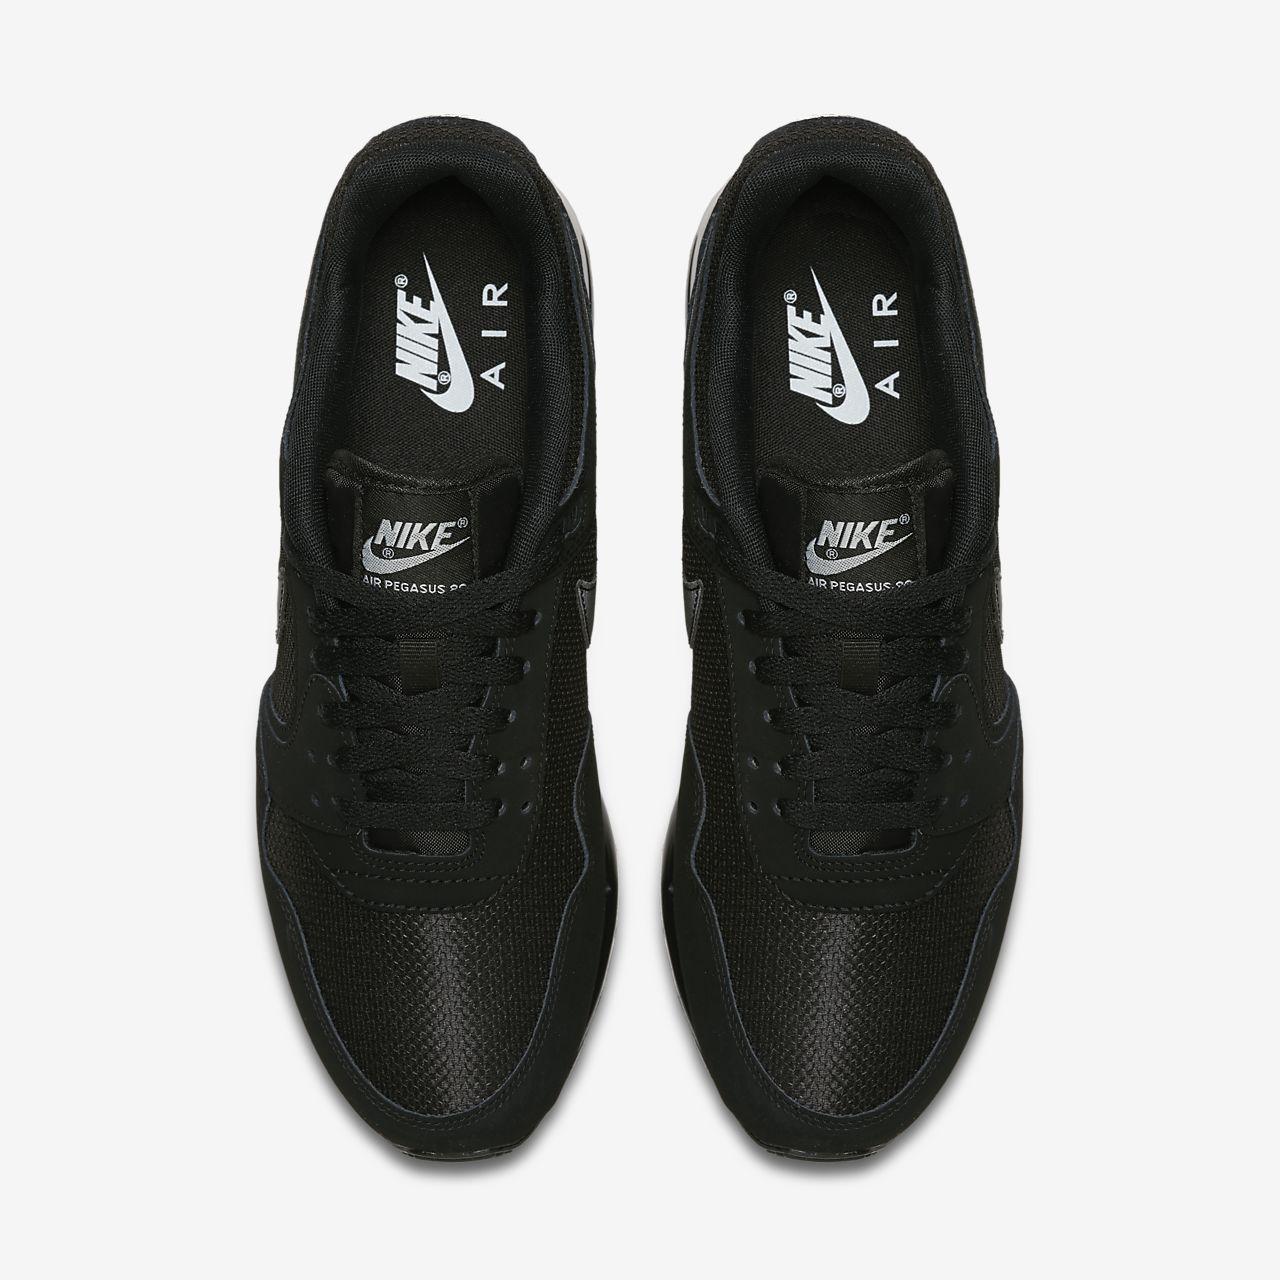 75f99bf2f800 Nike Air Pegasus 89 Men s Shoe. Nike.com GB